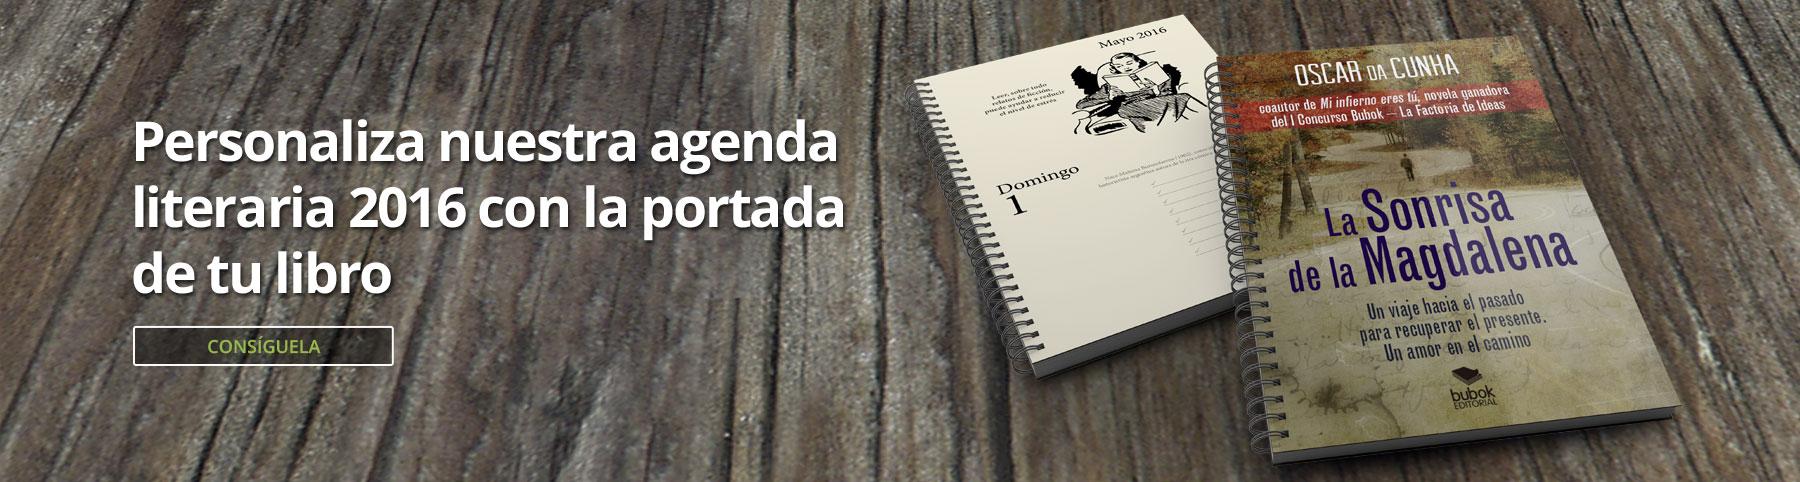 http://www.bubok.es/blog/nueva-agenda-literaria-2016/